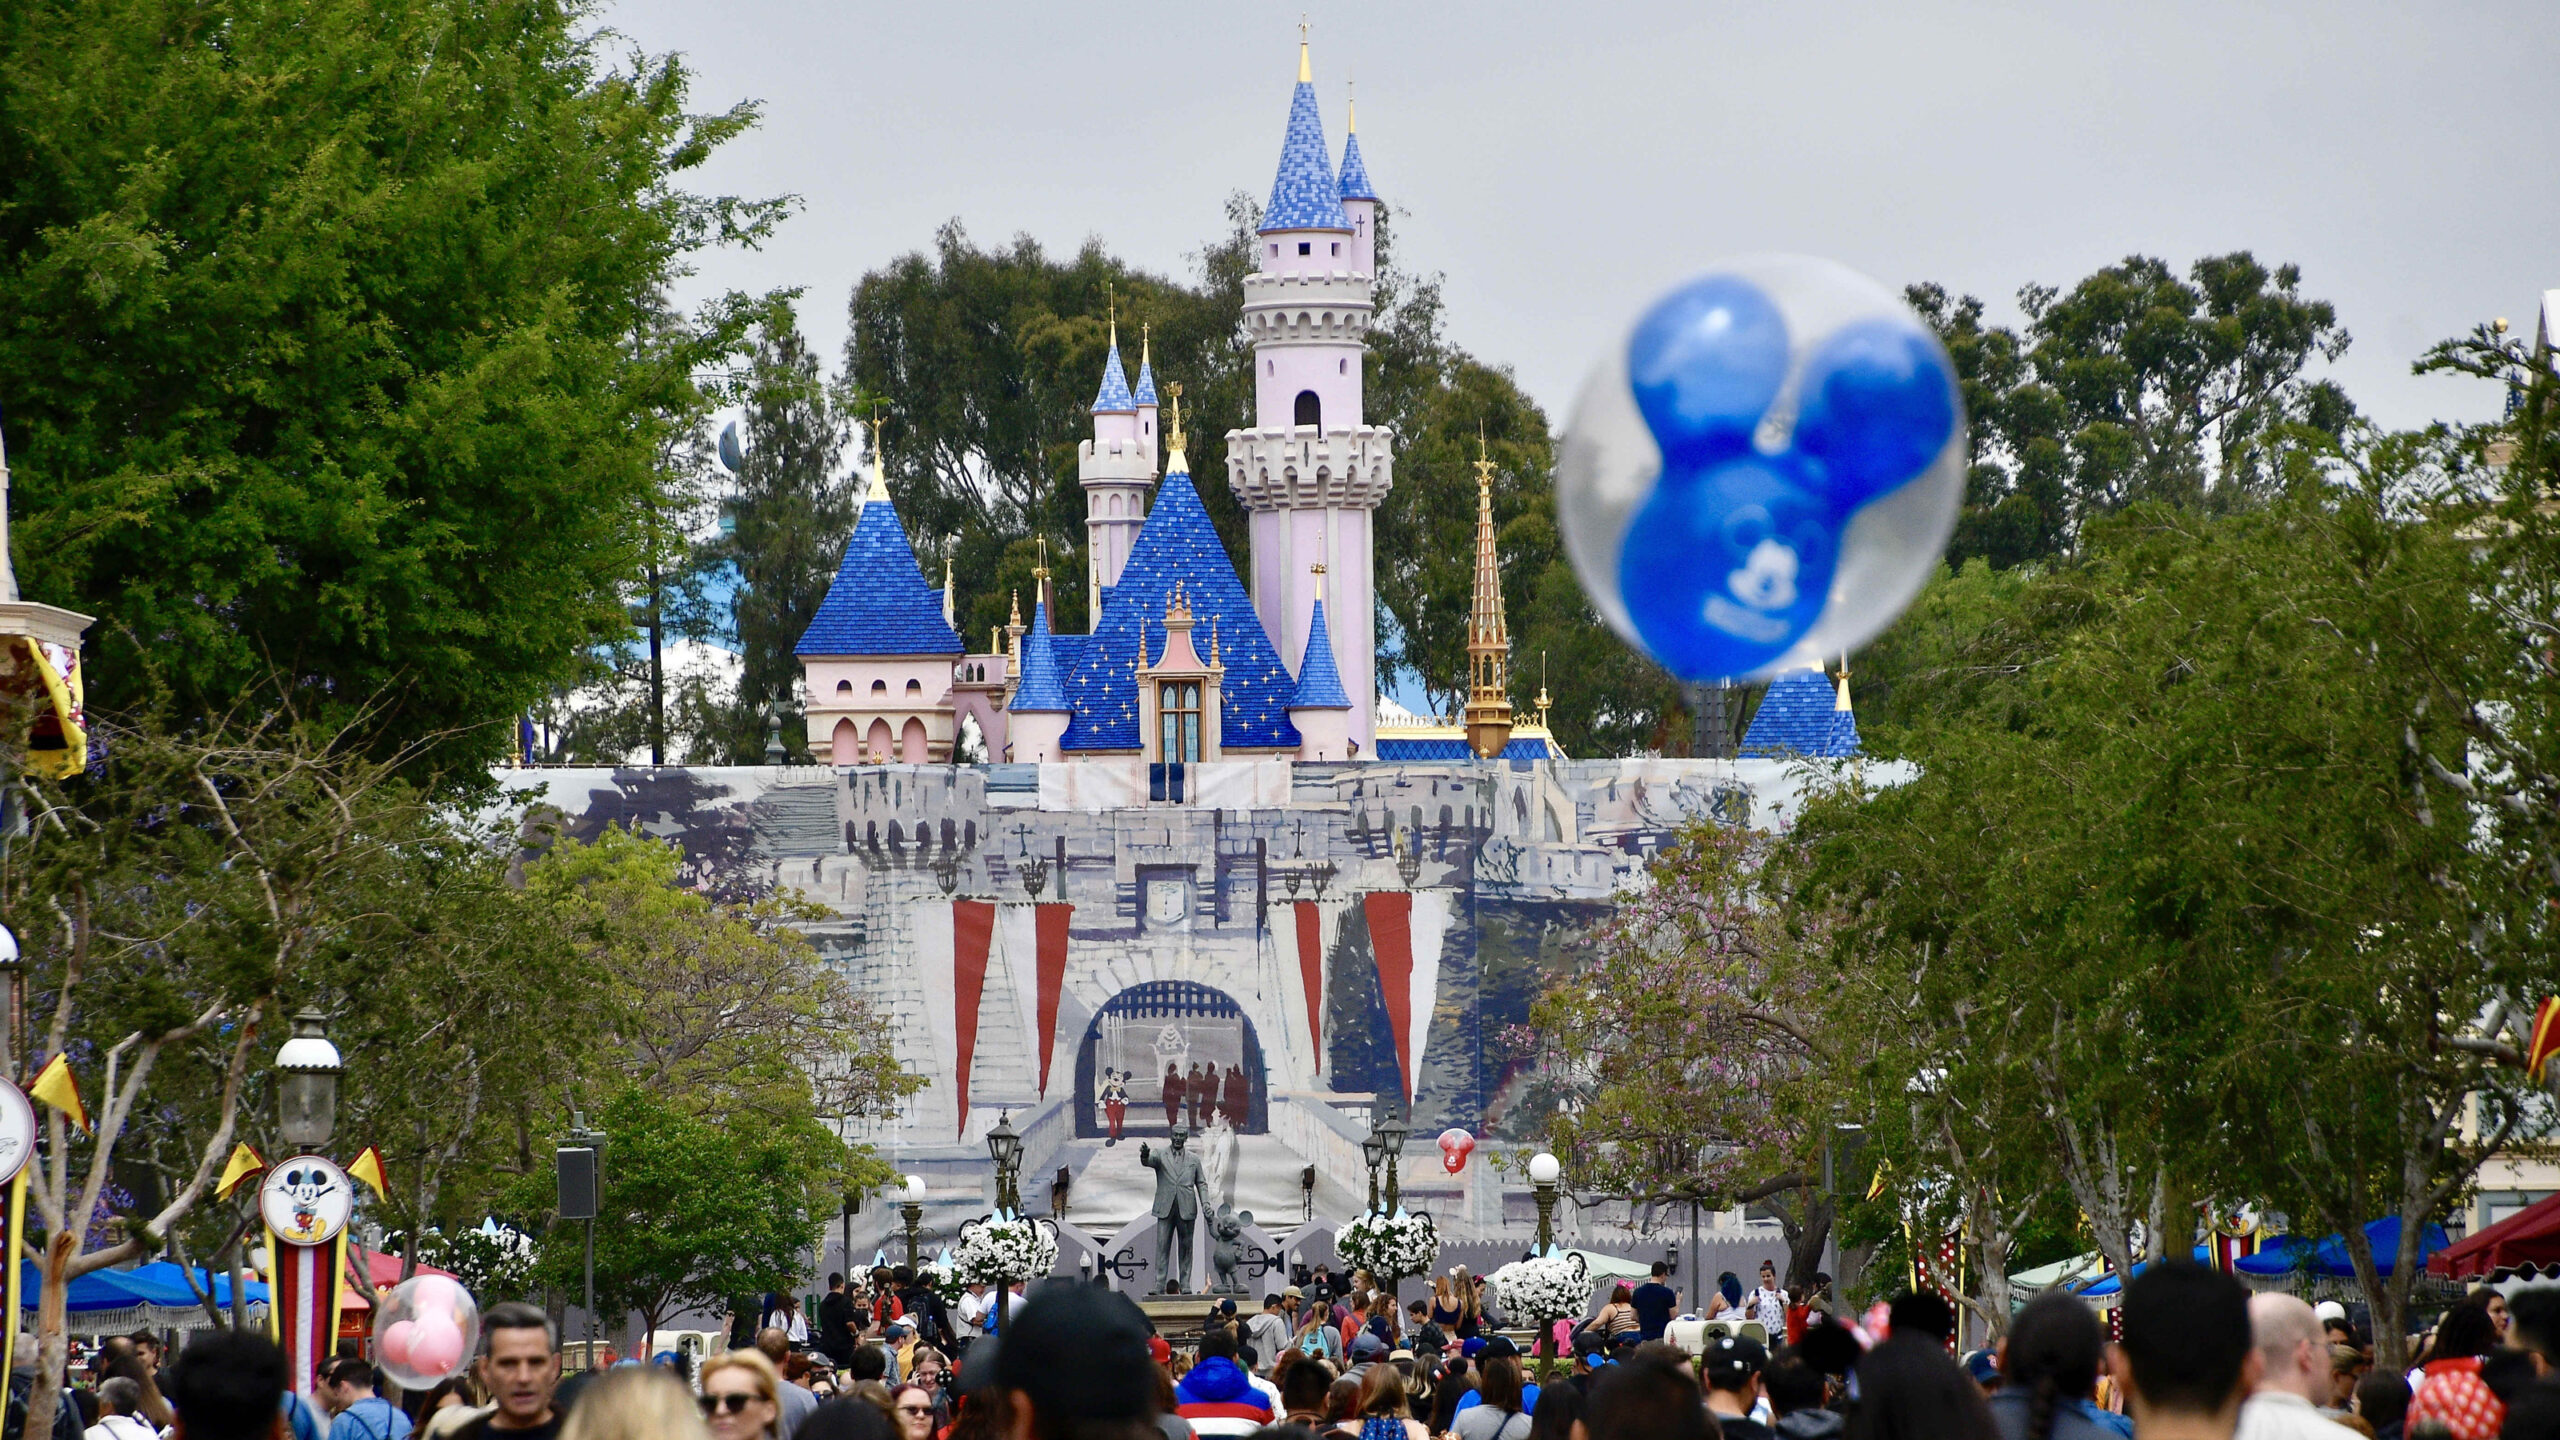 List Of Rides At Disneyland 2021